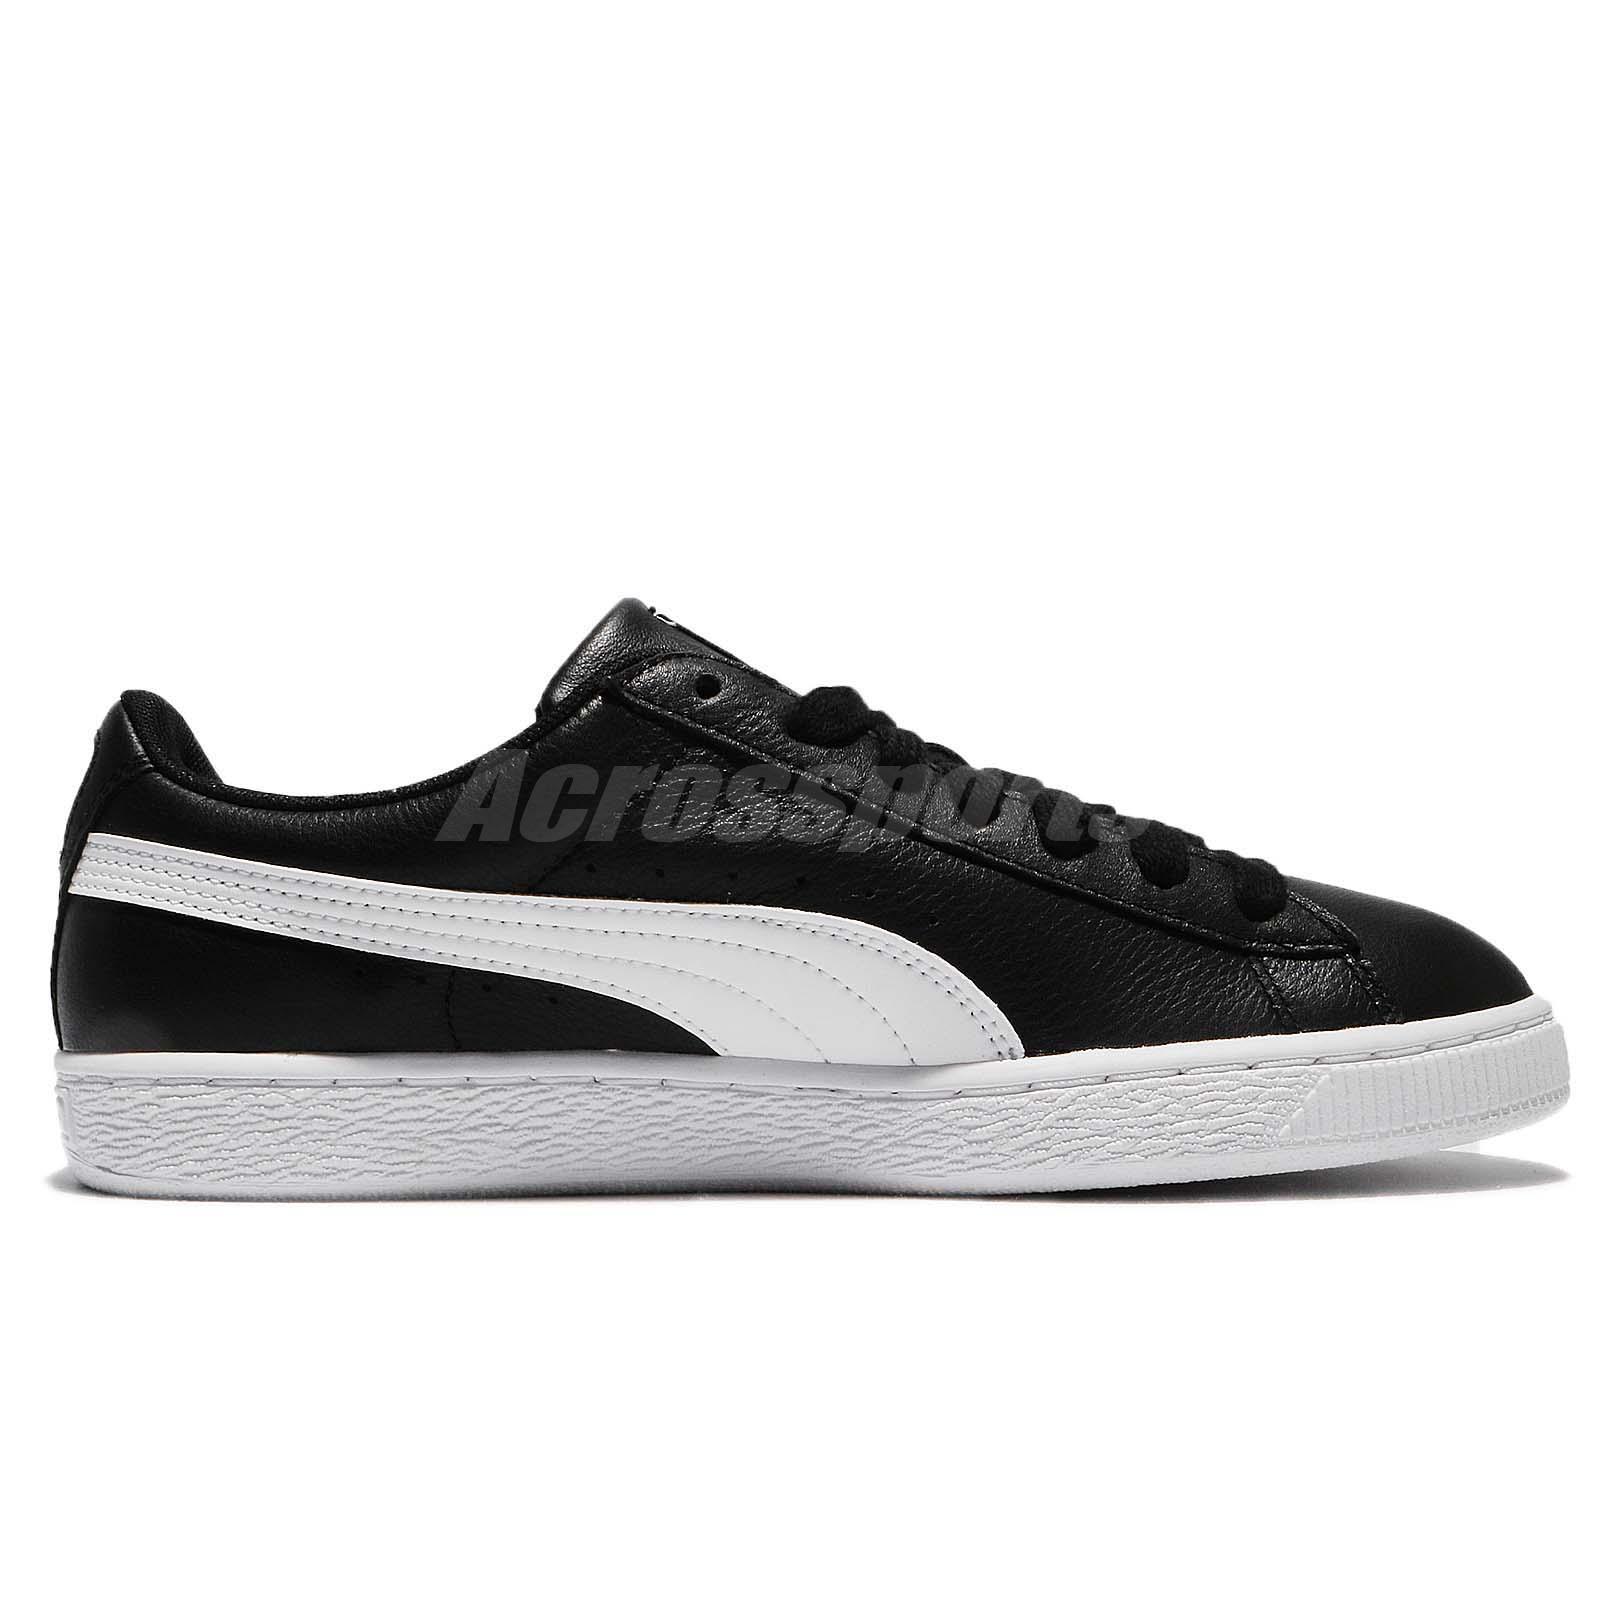 Puma Basket Classic LFS Low Black White Men Shoes Sneakers Trainers ... 521bd71bd